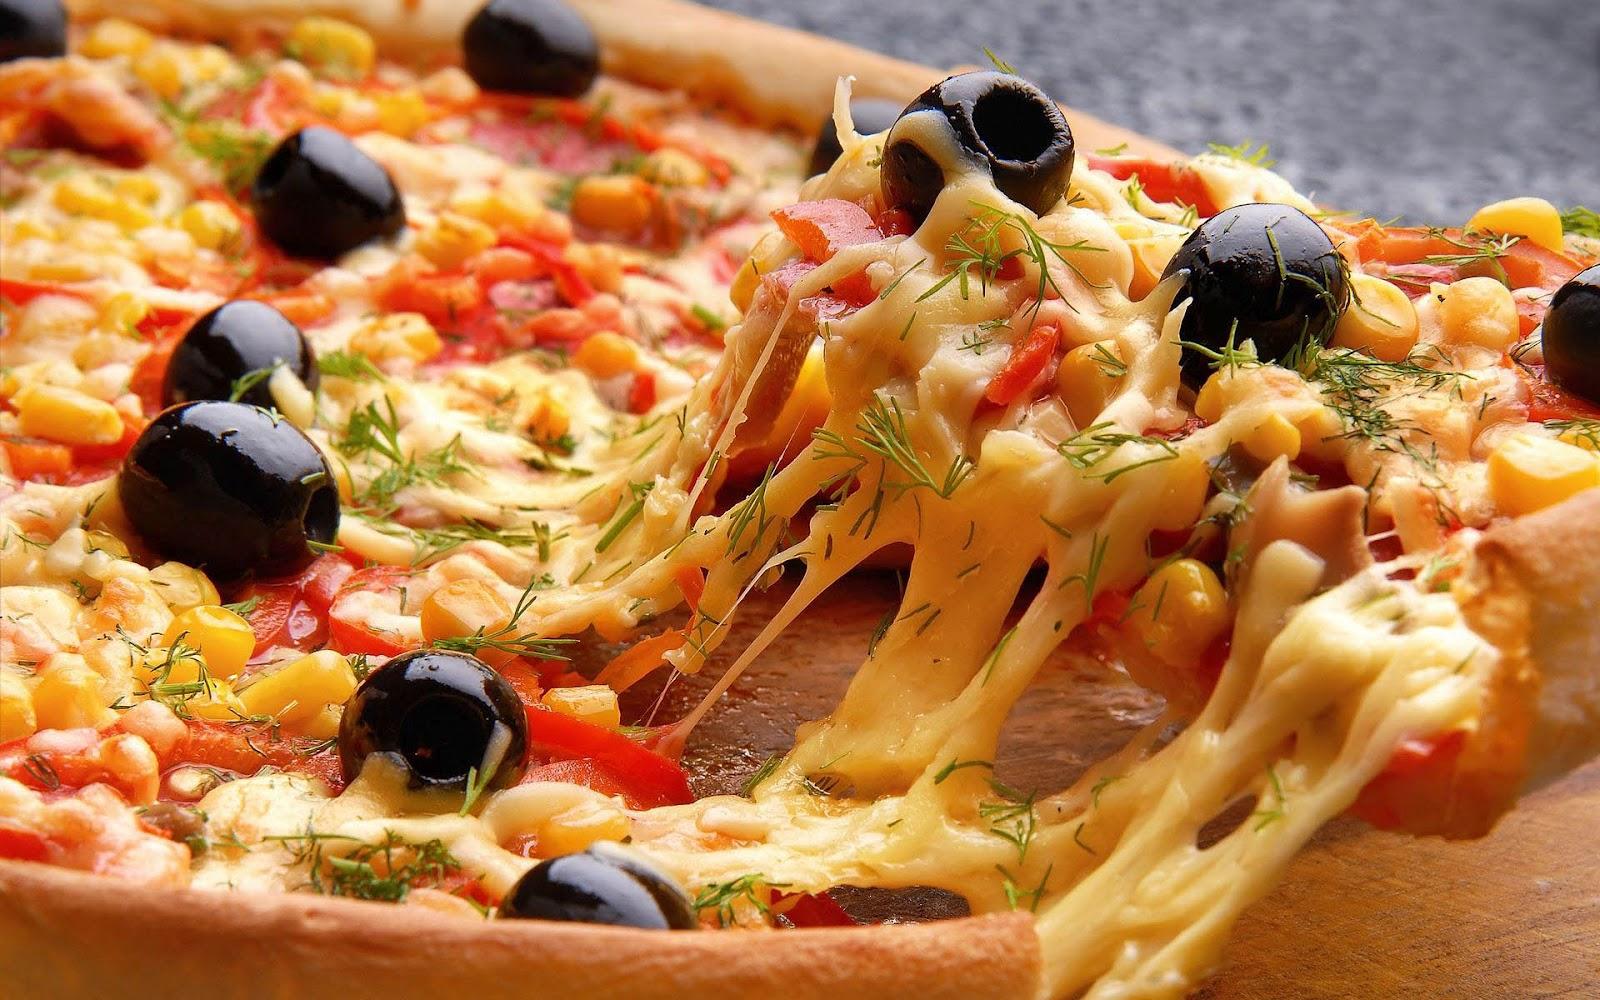 http://1.bp.blogspot.com/-fo2zvY5mUOg/UEUHMRR0I_I/AAAAAAAAF-I/W0eLJOuXG-w/s1600/hd-pizza-wallpaper-lekkere-verse-pizza-met-gesmolten-kaas-en-hd-eten-achtergrond-foto.jpg